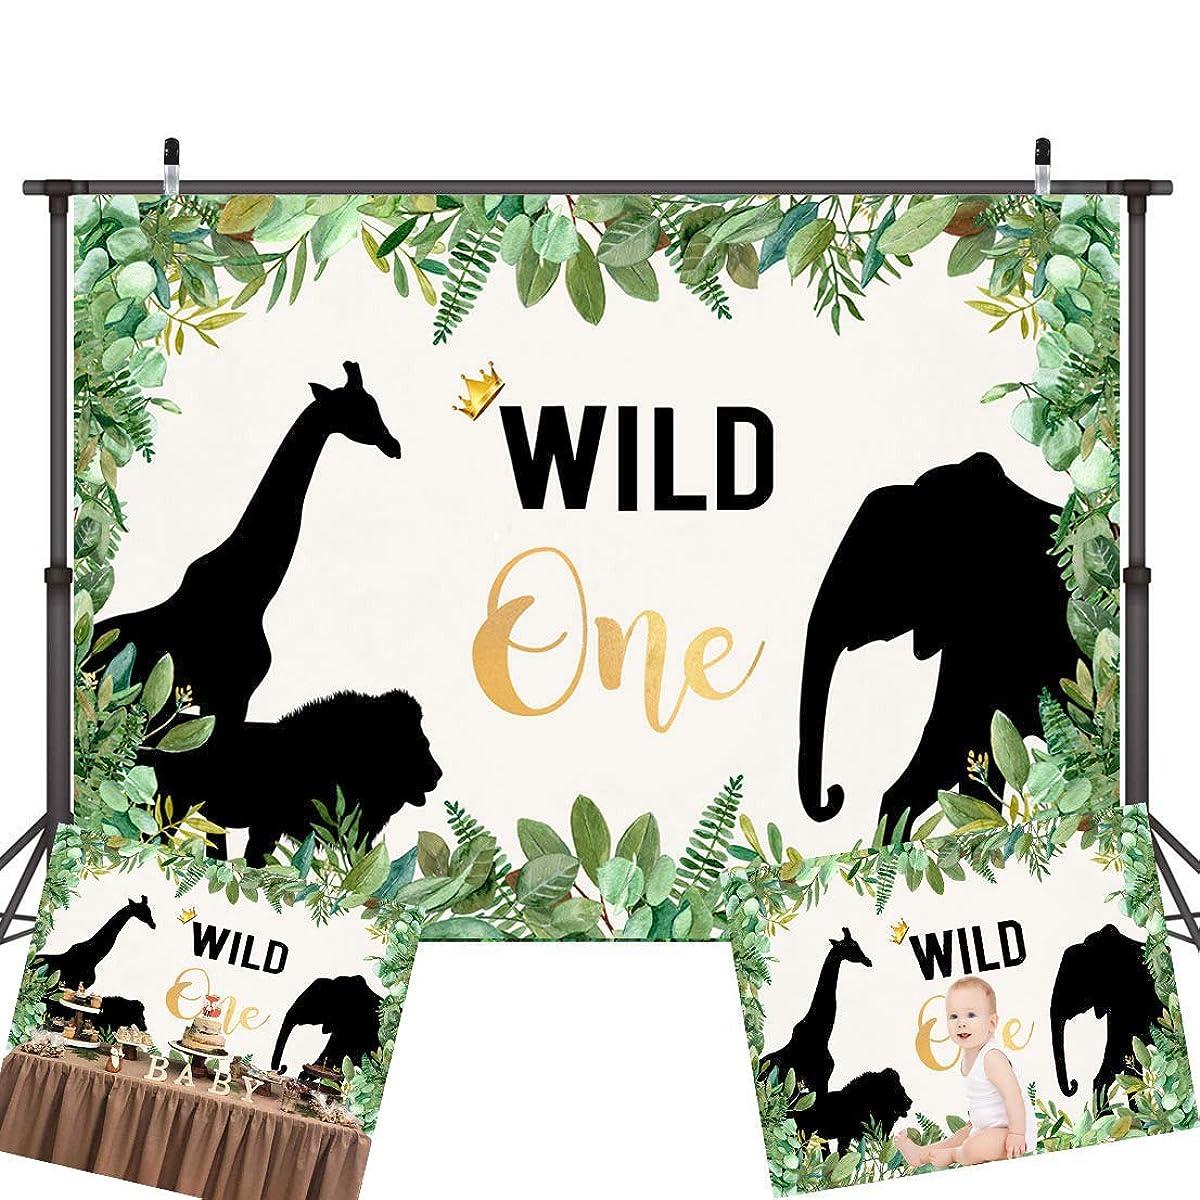 Art Studio The Wild Things One 1st Birthday Party Photography Backdrops Animals Themed Photo Background Jungle Safari Boy Studio Props Banner Decor Vinyl 7x5ft